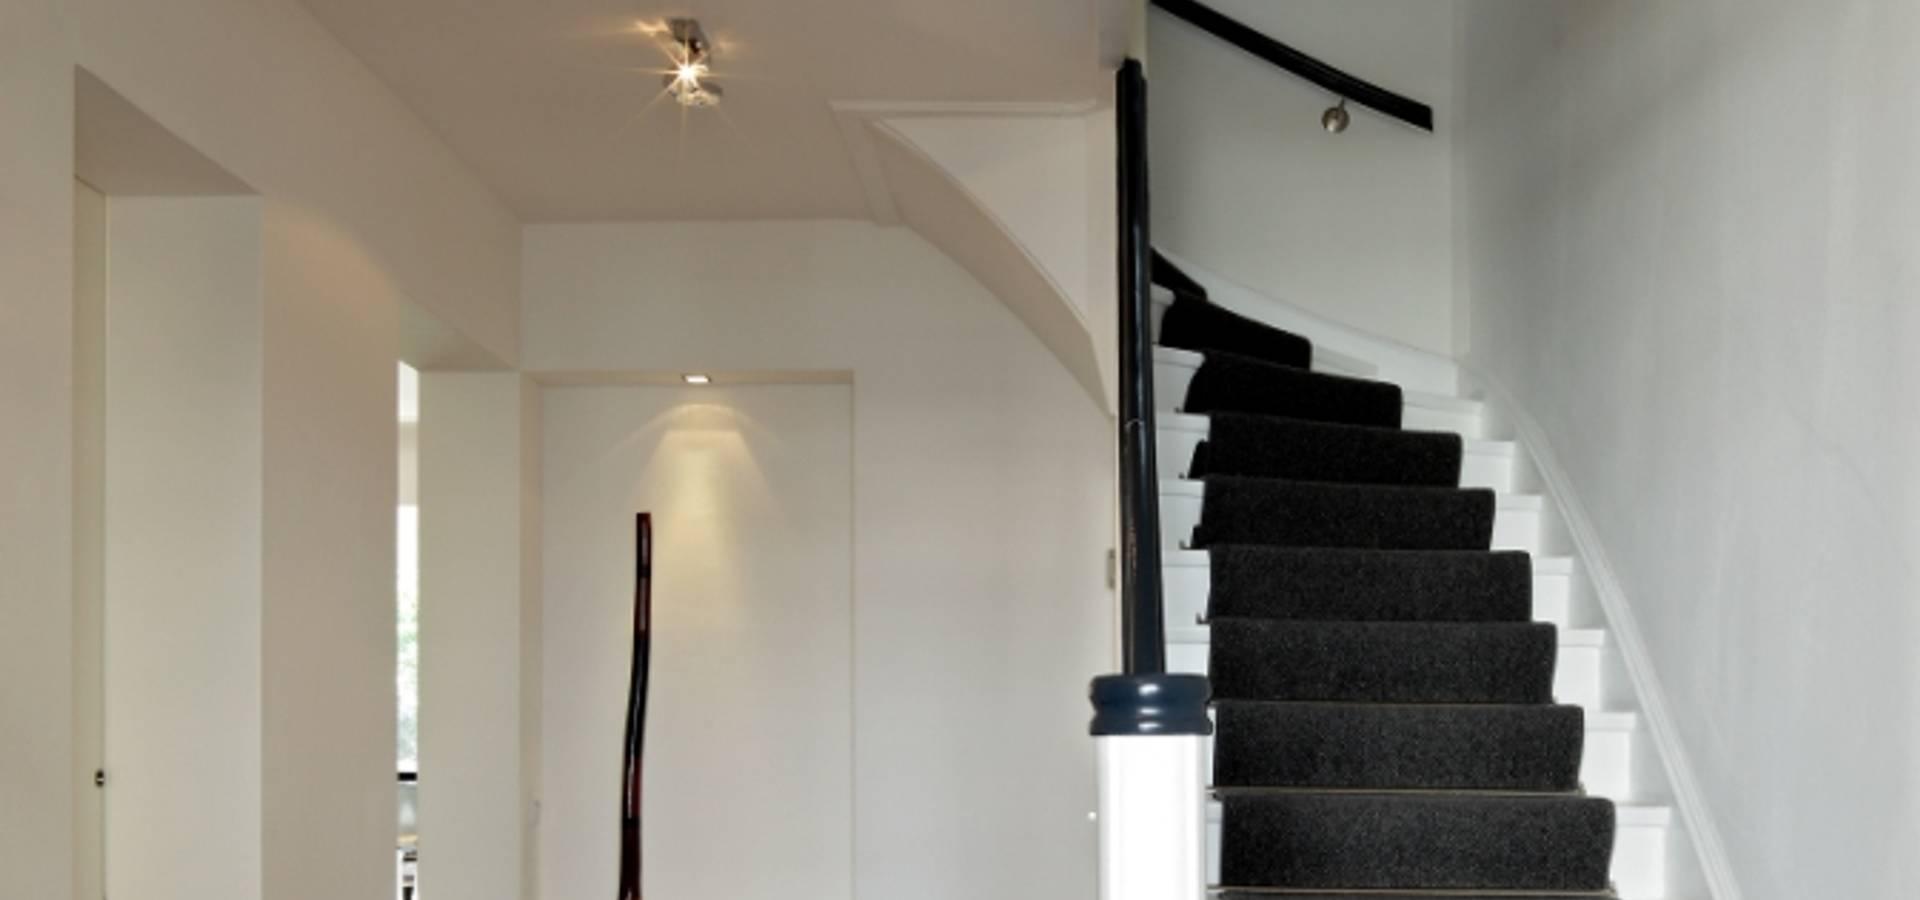 stadtvilla by innendesigner kemper d chting gmbh homify. Black Bedroom Furniture Sets. Home Design Ideas